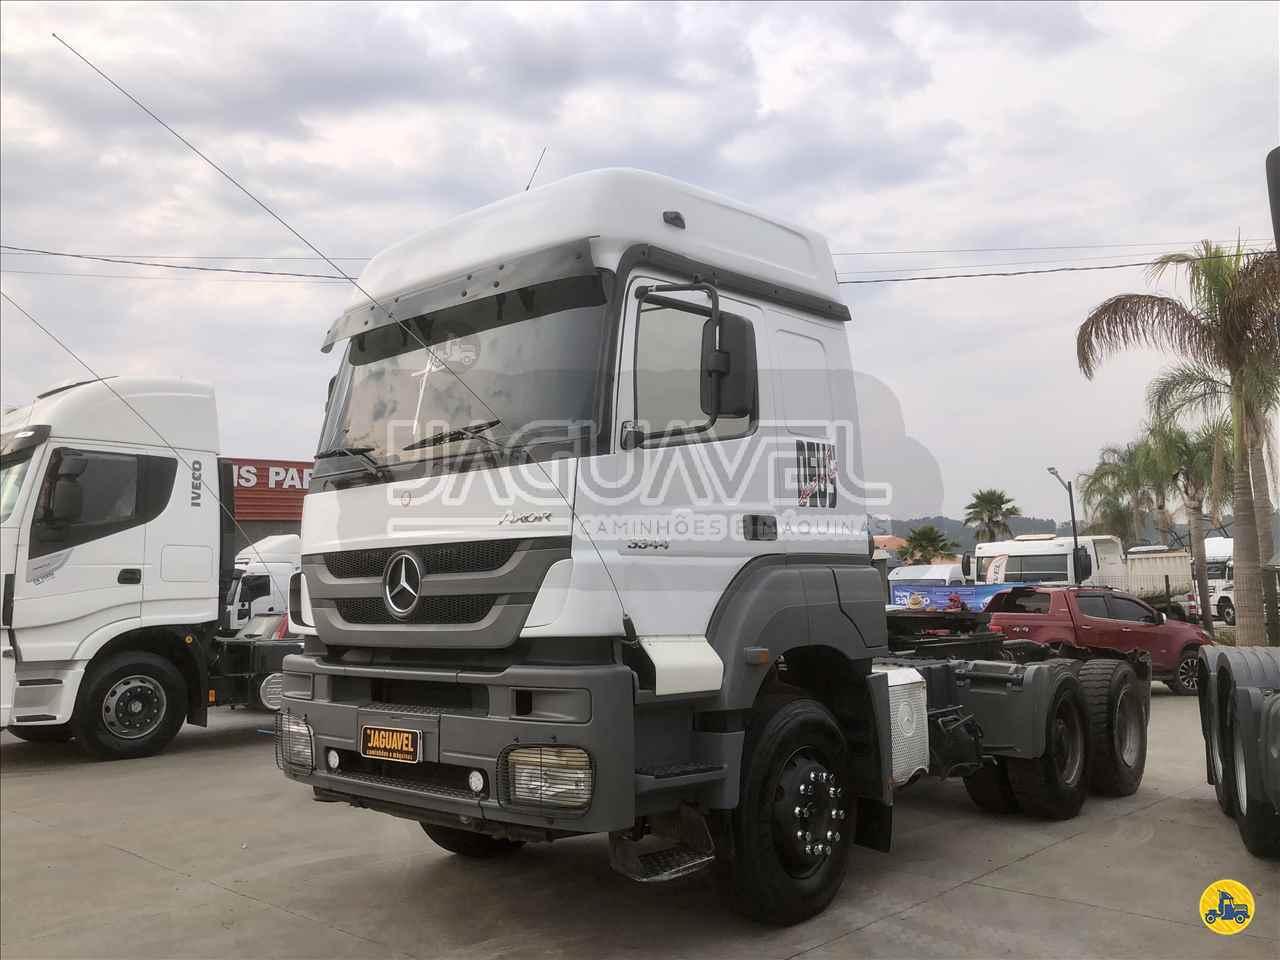 MB 3344 de Jaguavel Caminhões - JAGUARIAIVA/PR